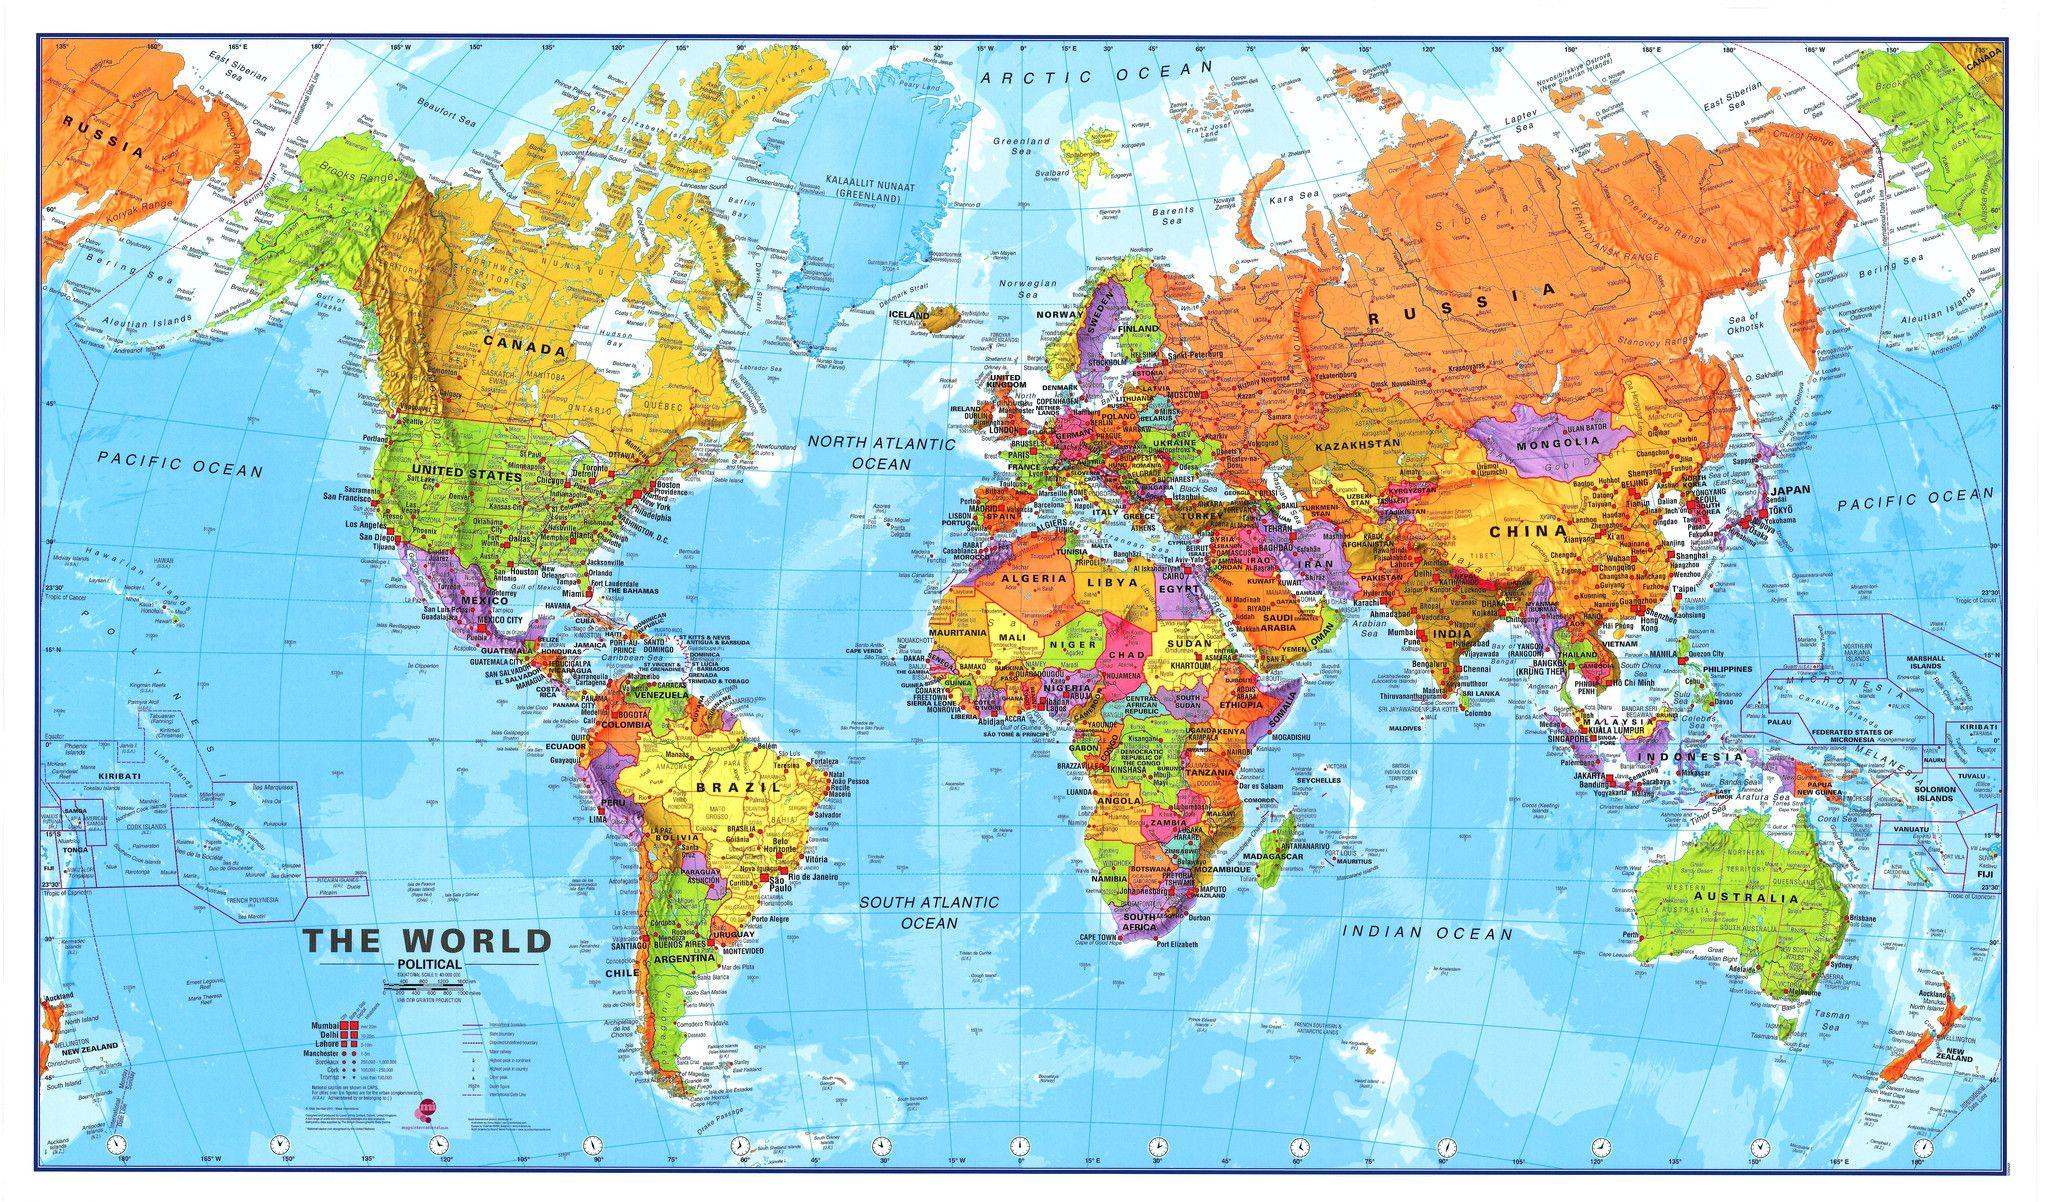 World maps international 120 million supermap 2000 x 1200mm world maps international 120 million supermap mapworld gumiabroncs Images